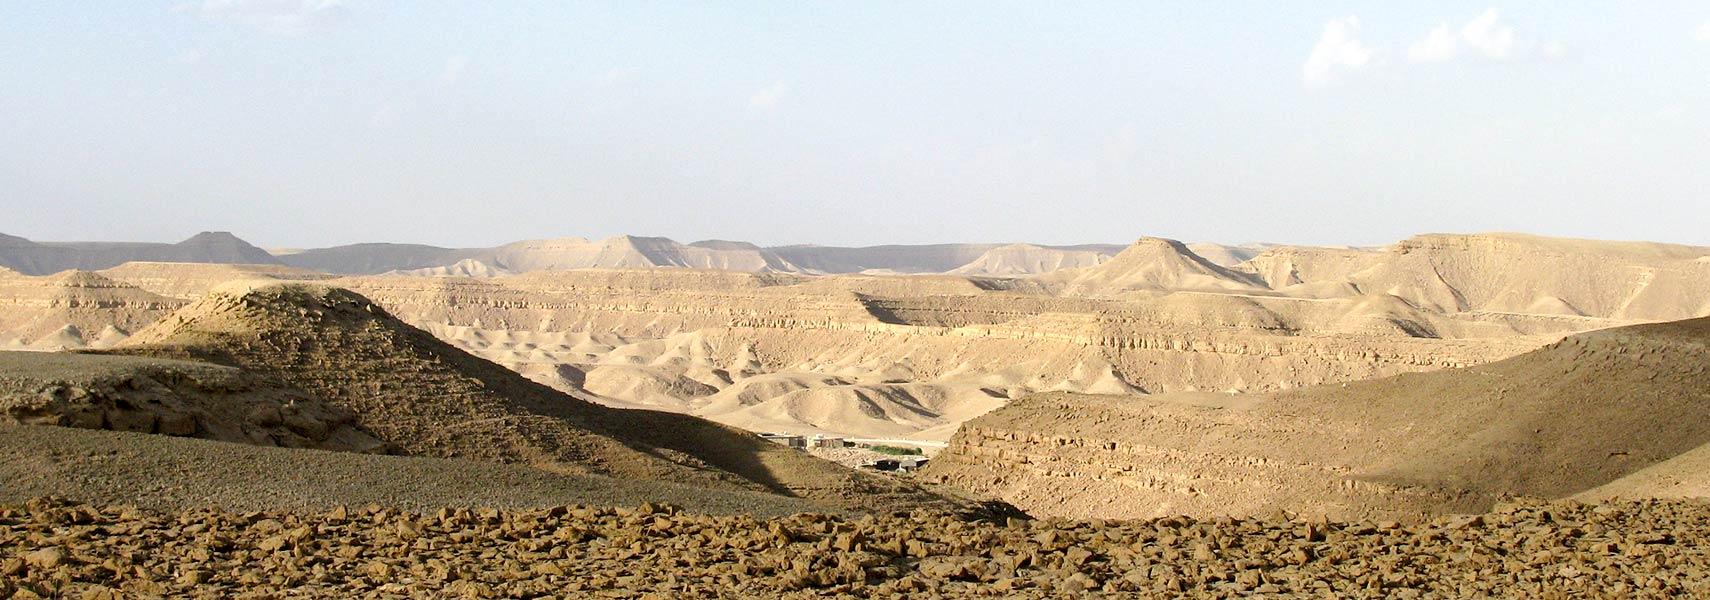 Sedimentary strata Saudi Arabia